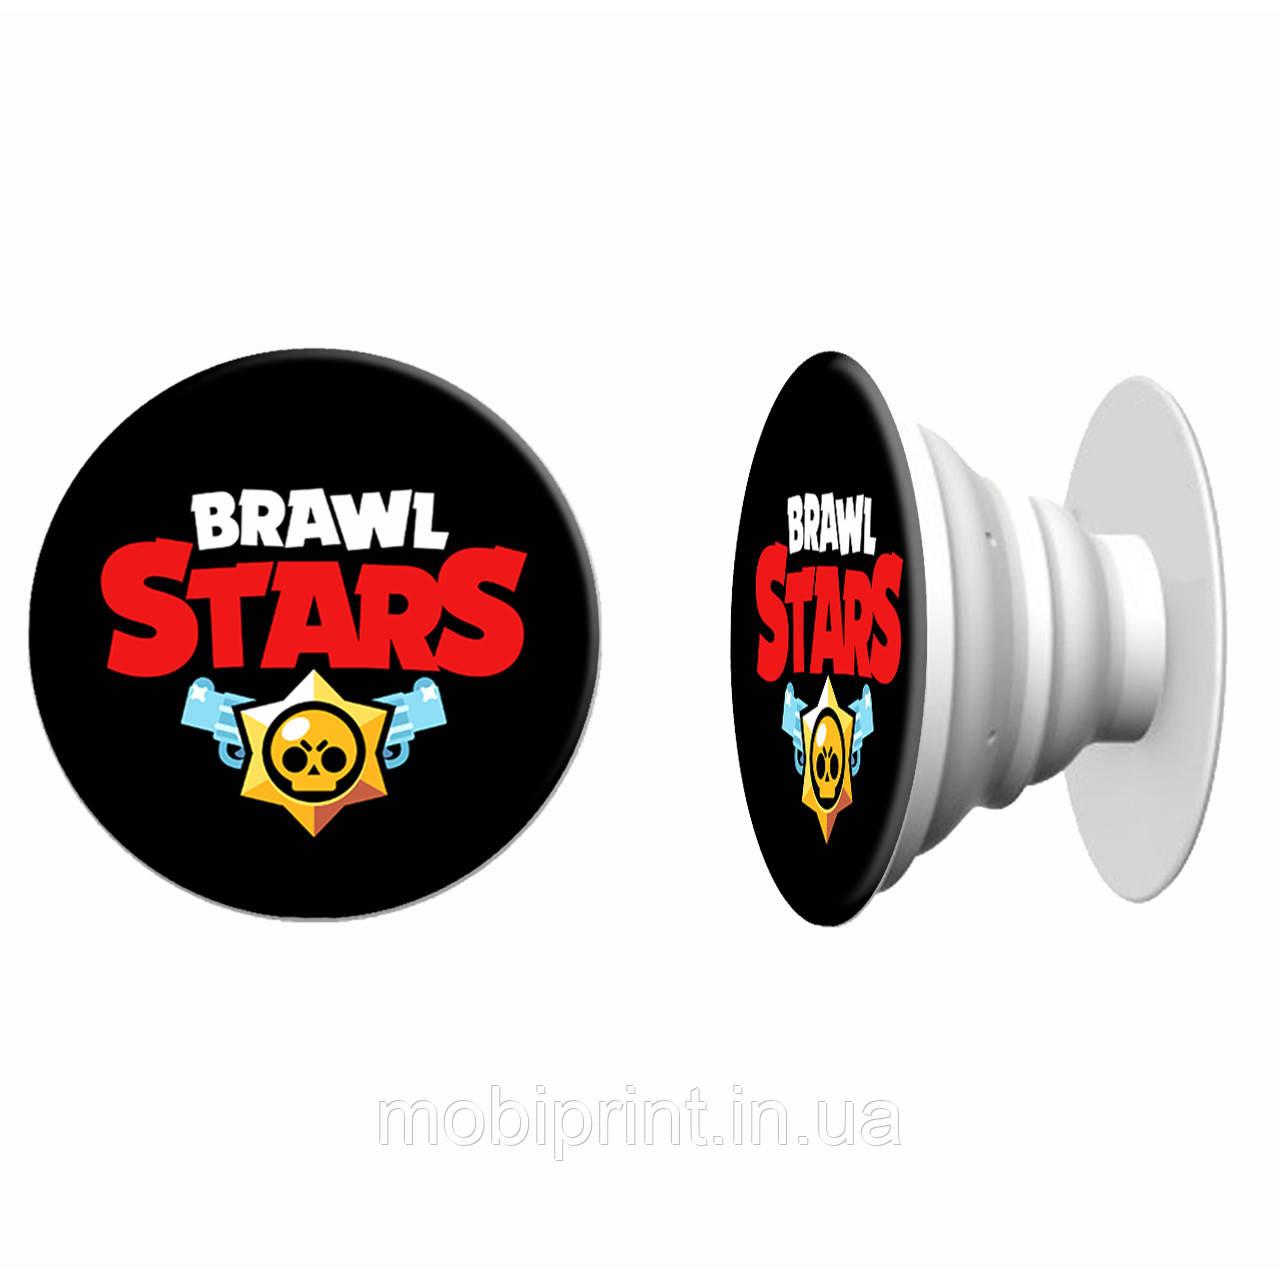 Попсокет (Popsockets) держатель для смартфона Бравл Старс (Brawl stars) (4078-1060) Белый